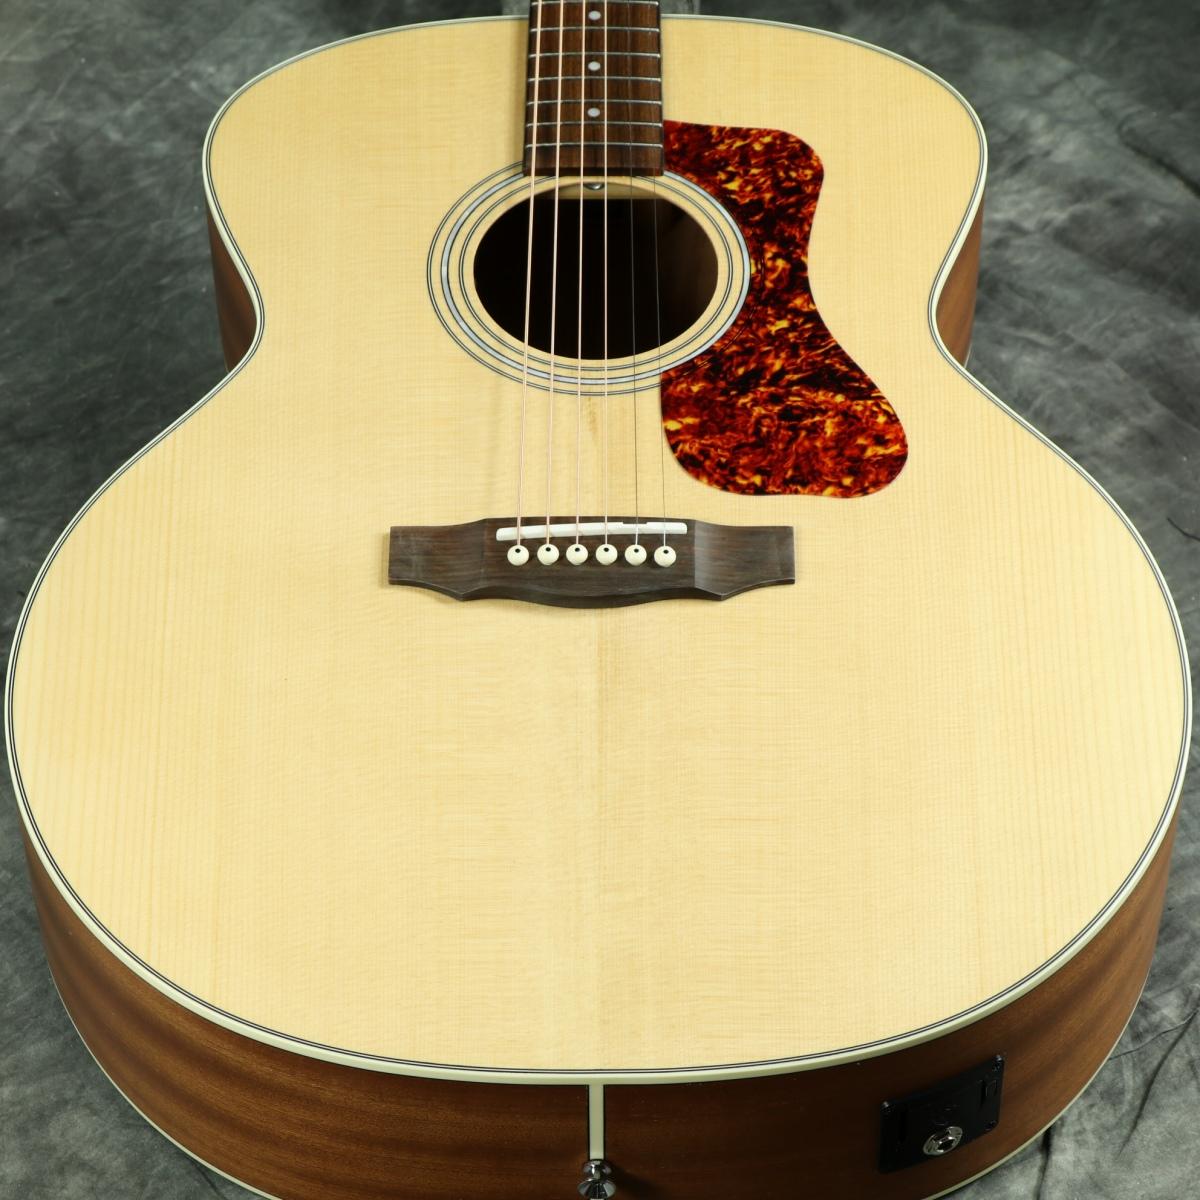 Guild F-240E NAT ナチュラル ギルド アコースティックギター 池袋店 エレアコ 倉 定価の67%OFF フォークギター F240E